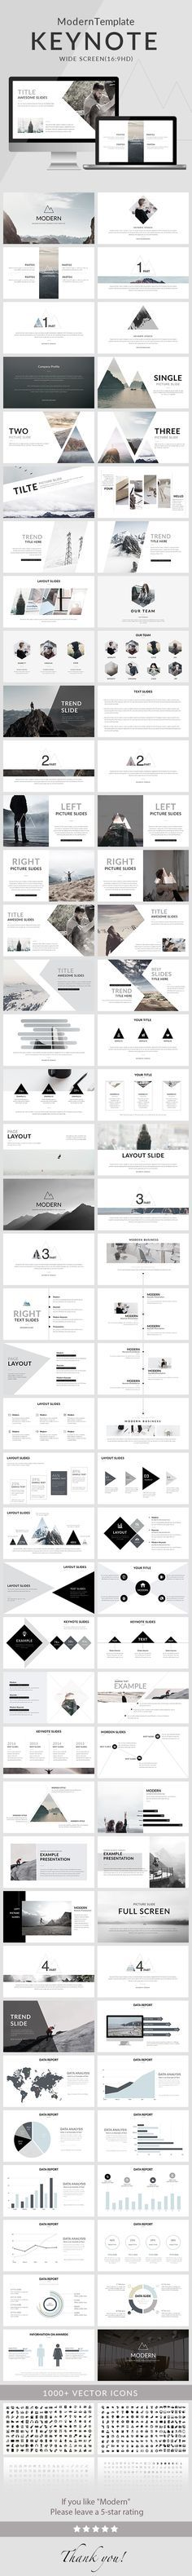 Modern - Clean trend Keynote Template - Creative Keynote Templates